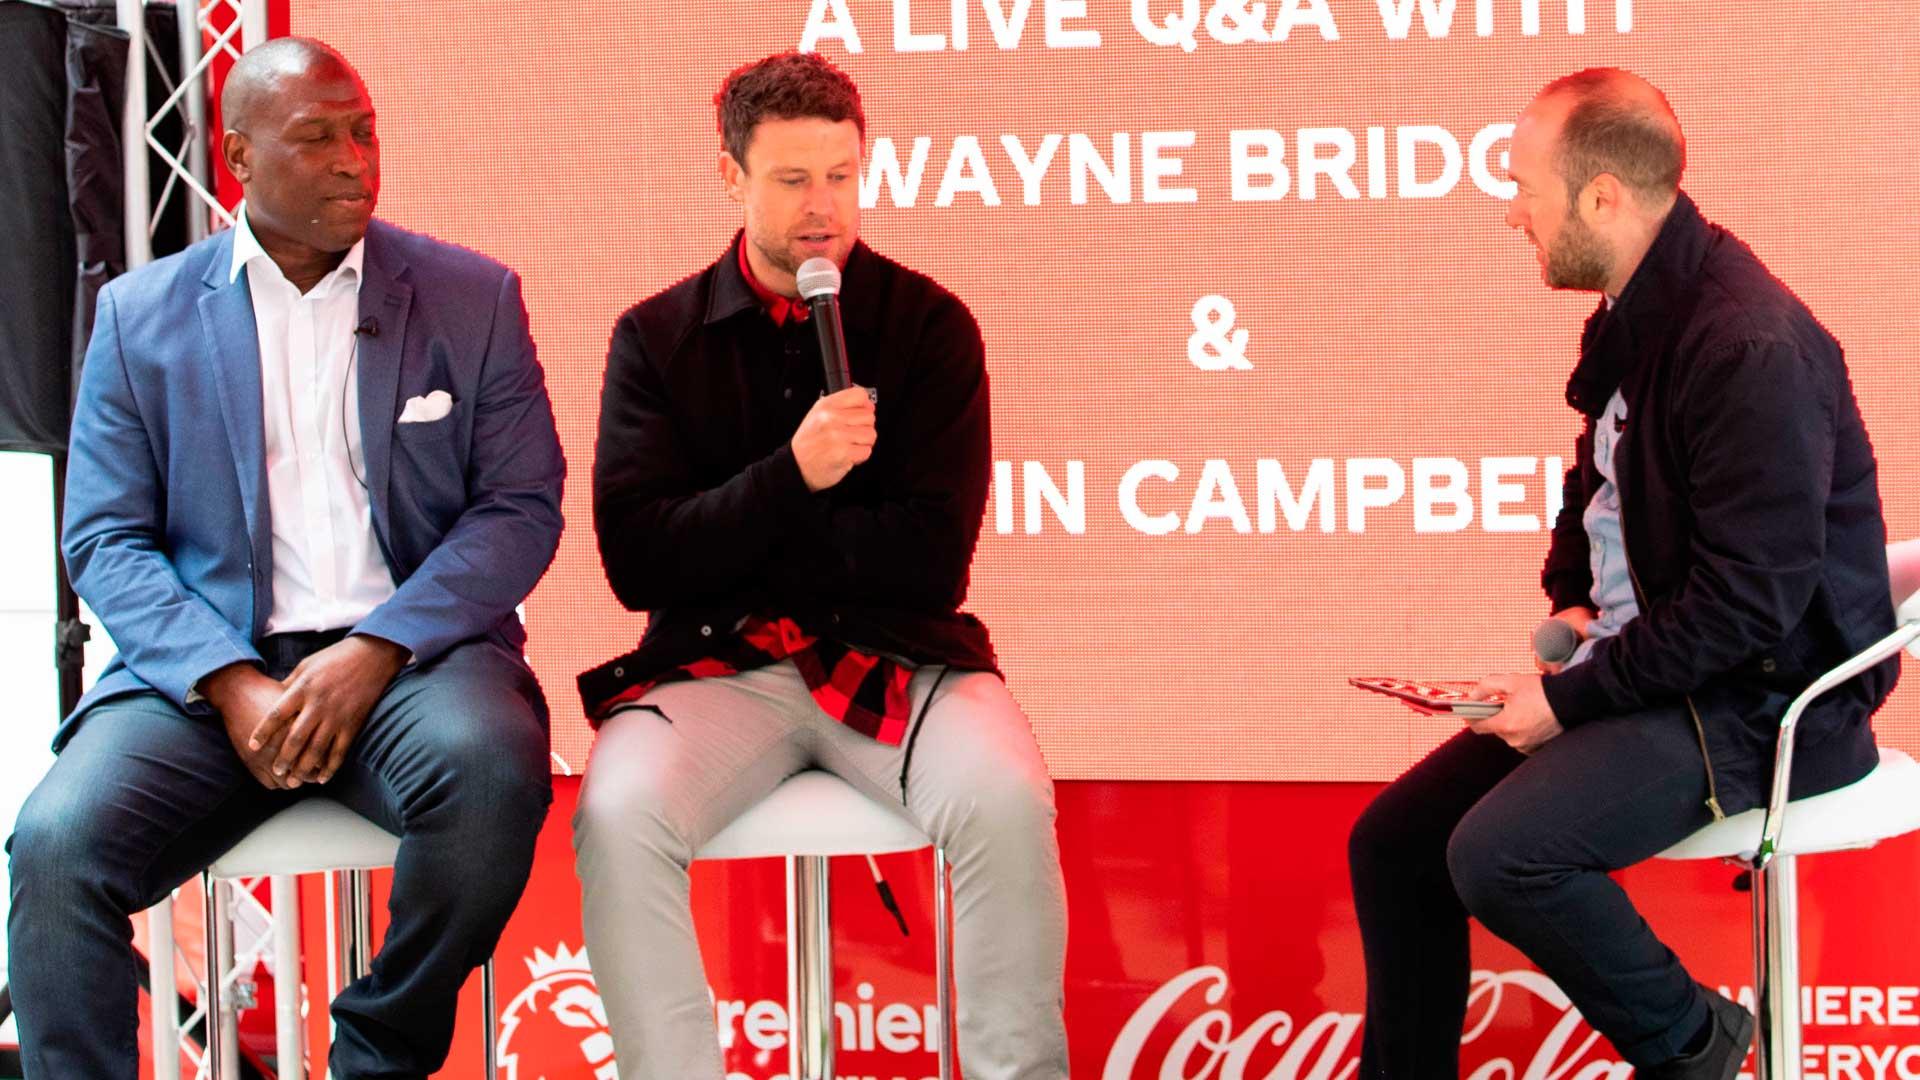 Wayne Bridge and Kevin Campbell